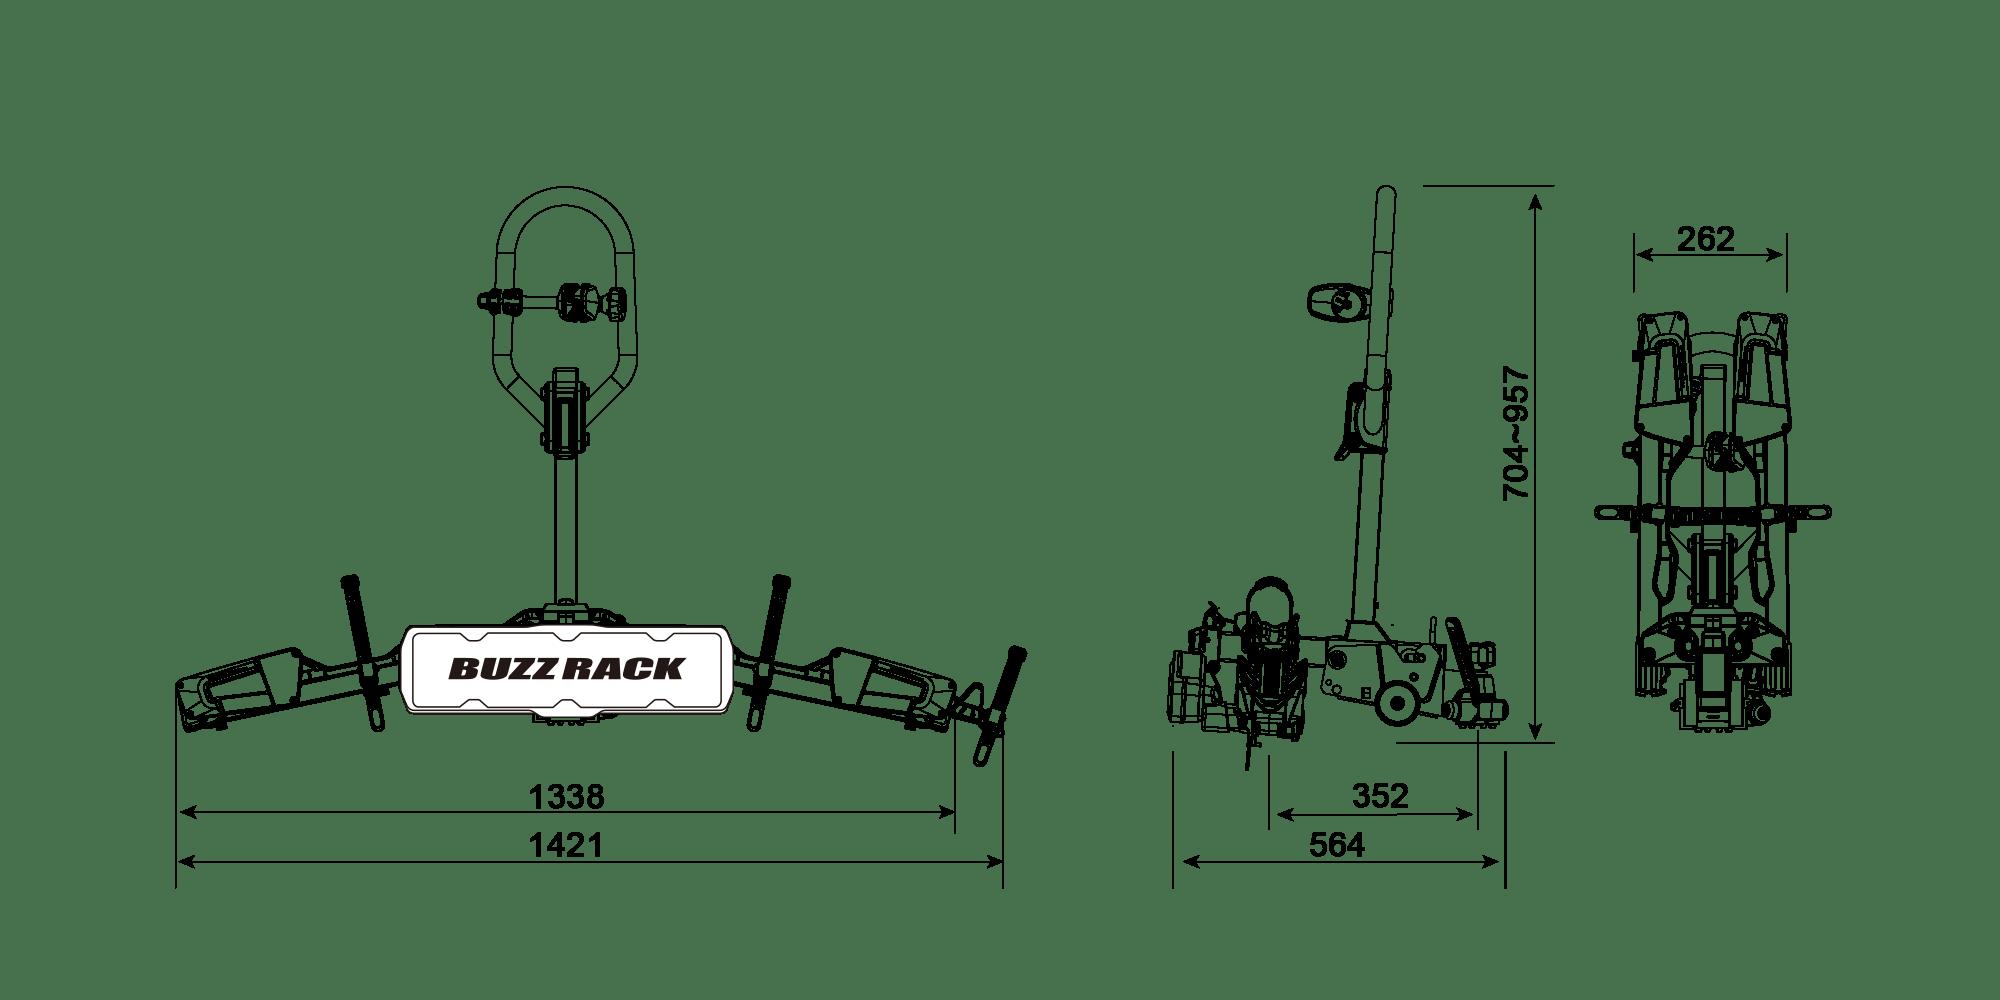 E Scorpion 1 Buzzrack